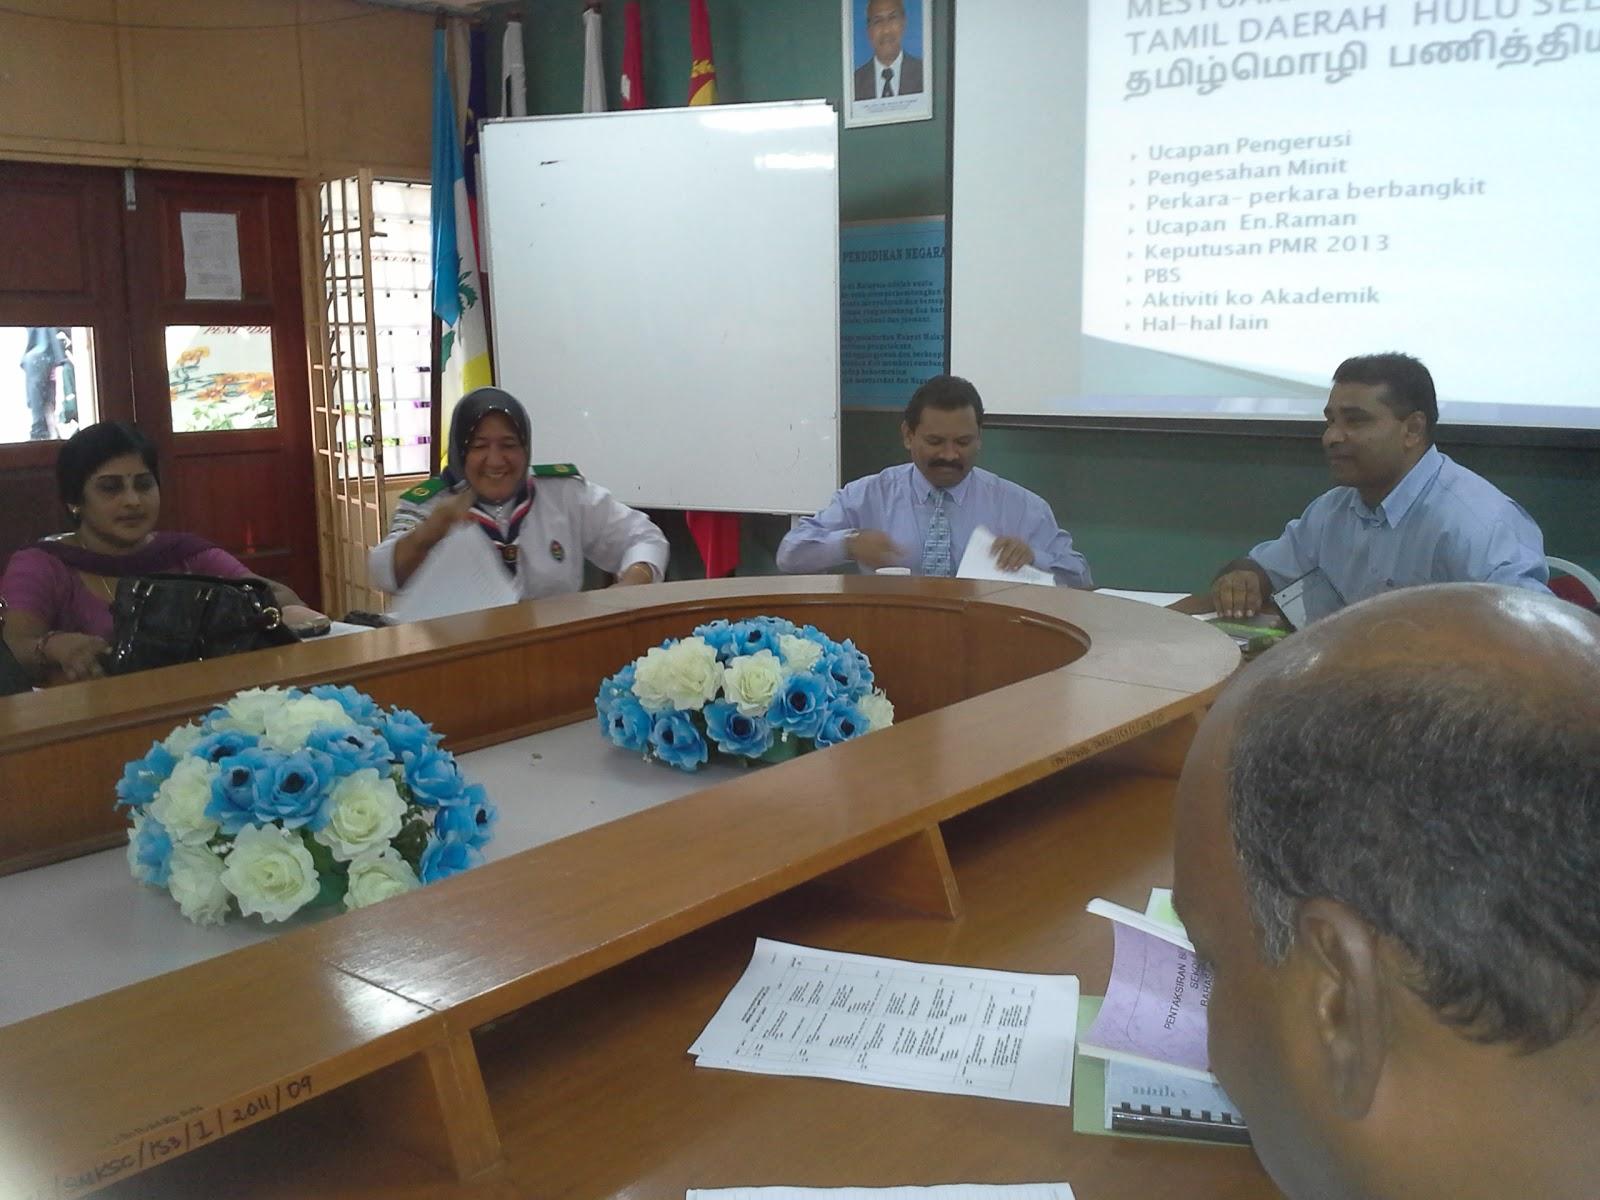 bahasa tamil Assalamualaikum wbt selamat semuabaru-baru ini saya belajar bahasa tamil dengan anak muridmenurut saya,bahasa tamil adalah bahasa yang agak sukar untuk.